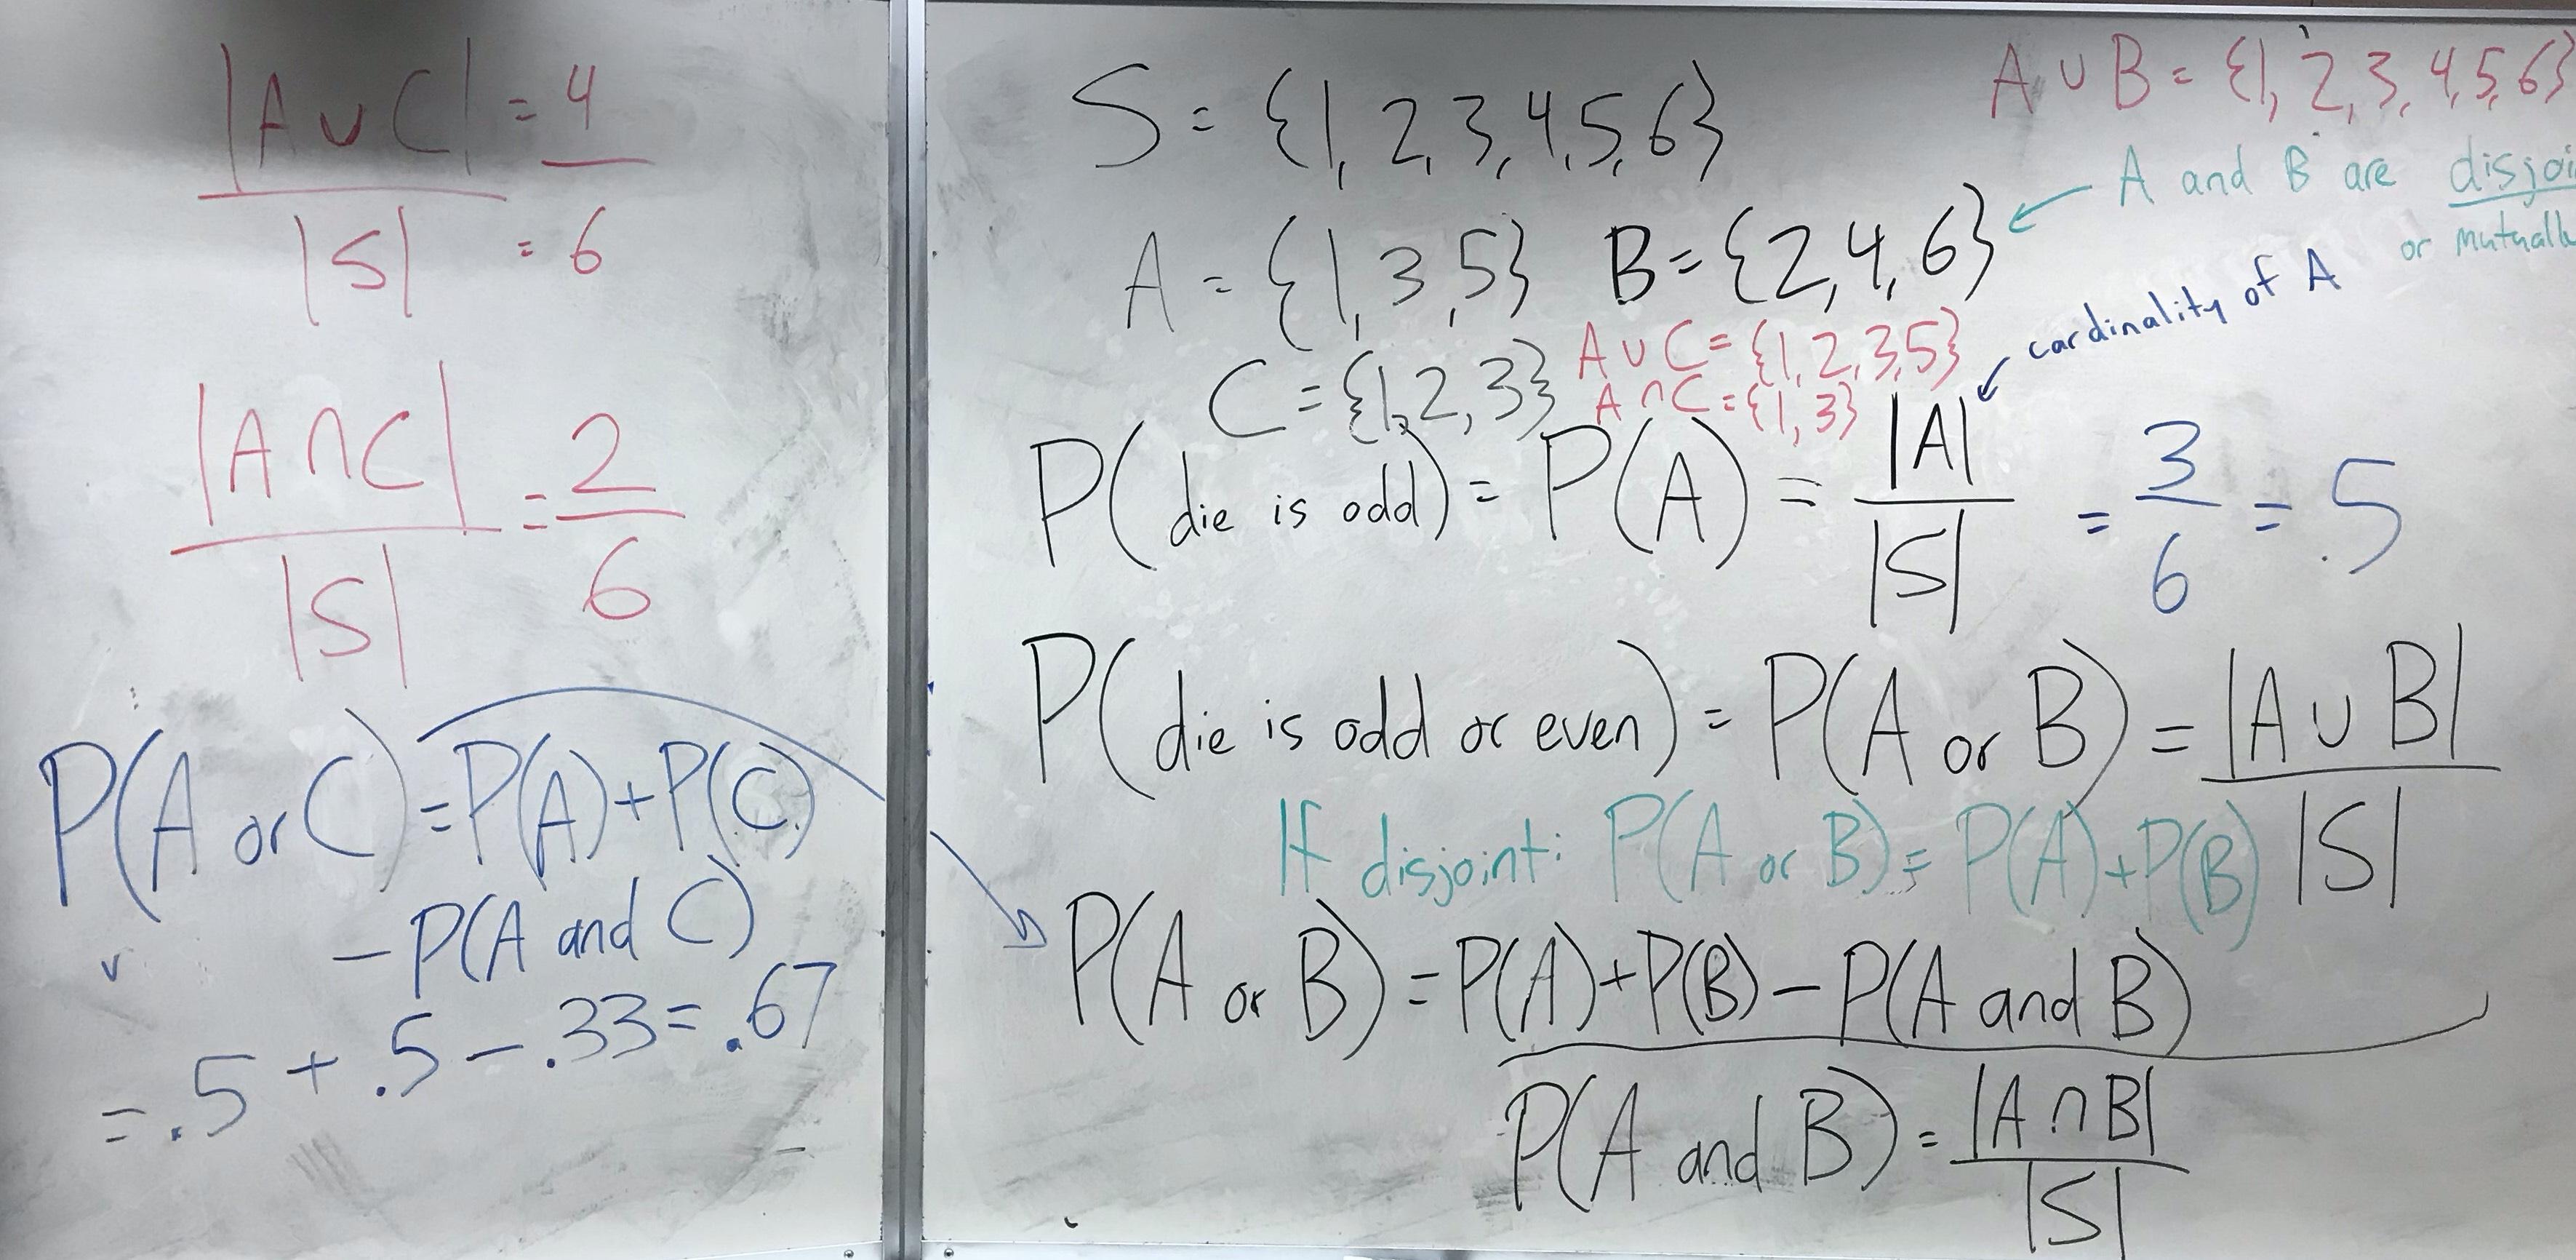 INFO-2301: Quantitative Reasoning - University of Colorado